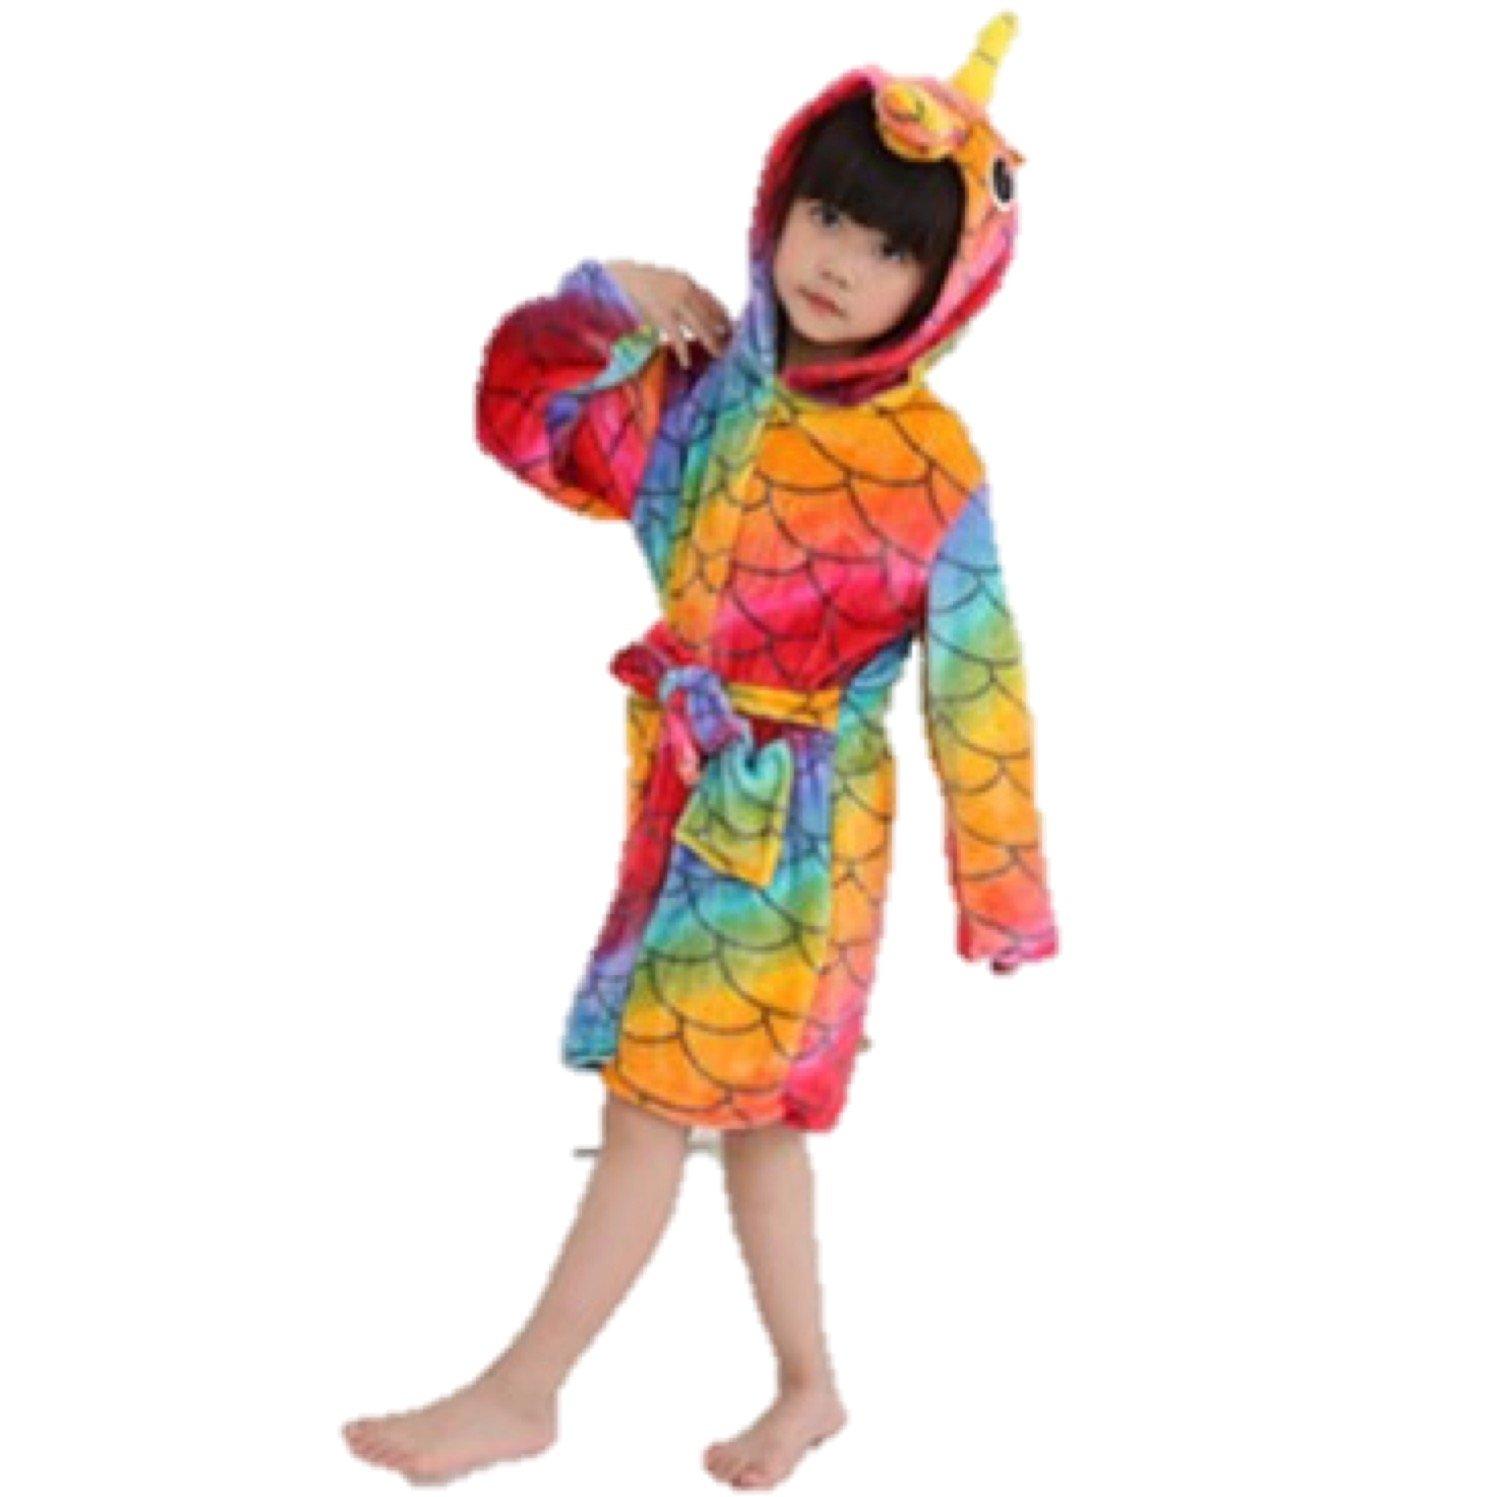 eBoutik Estrella de Chicas Arco Iris Sirena Unicornio Albornoz Bata 3D Cuerno M/ágico P/úrpura Rosa Amarillo Pijamas Pijamas